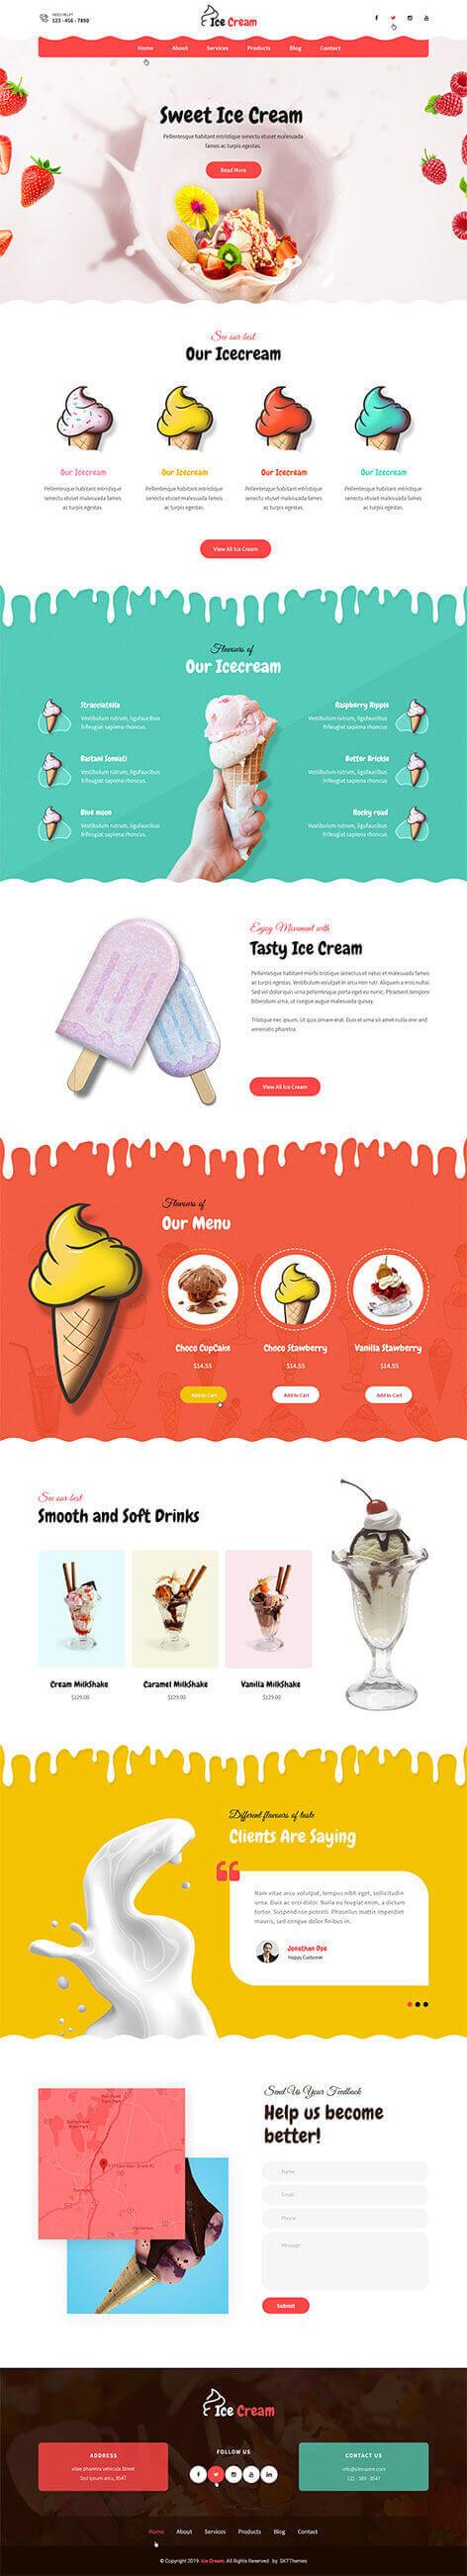 Ice Cream Parlor WordPress Theme